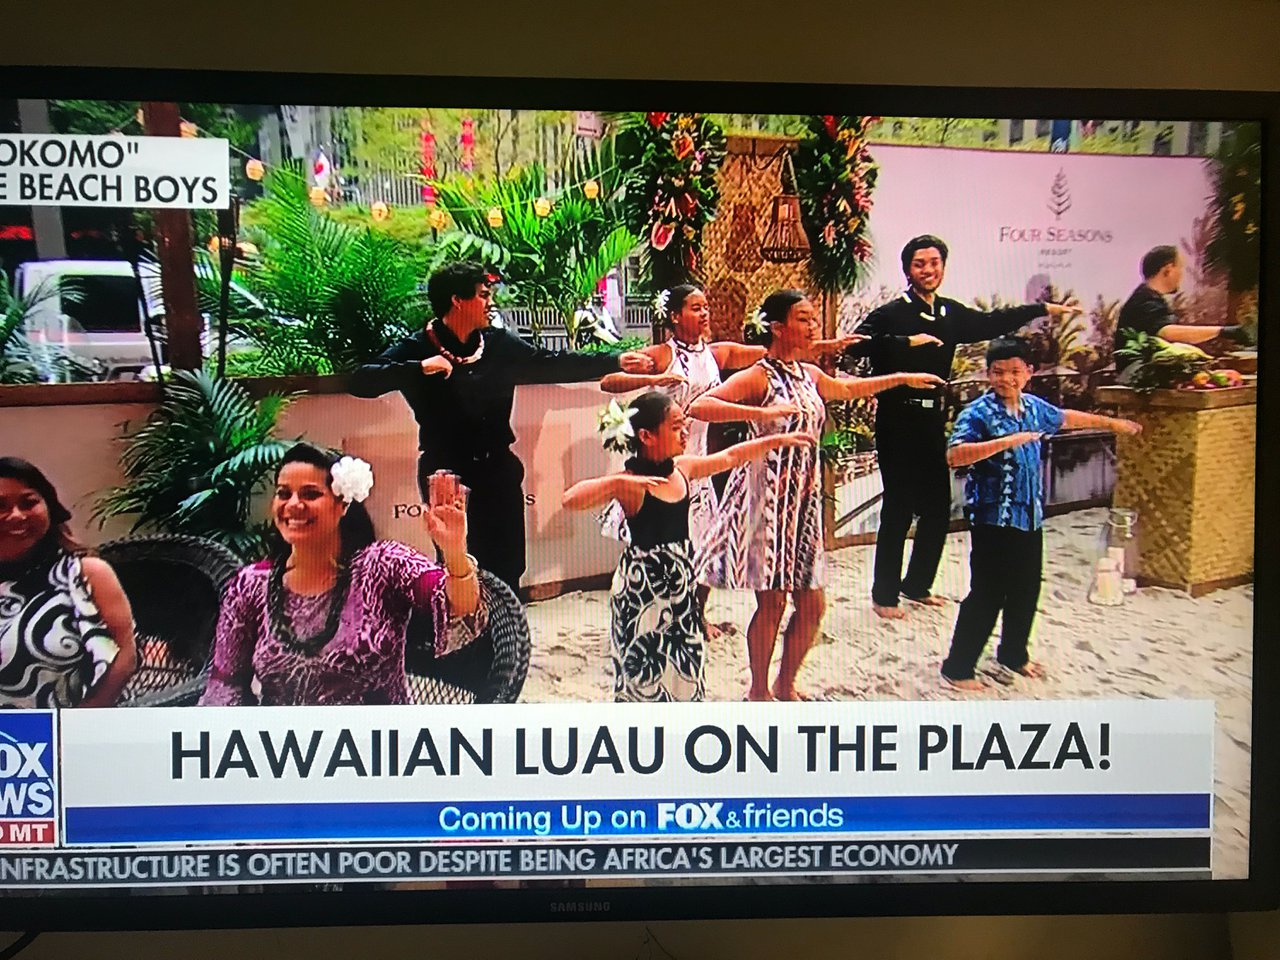 Hawaiin Luau on the plaza photo IMG_6917.jpg